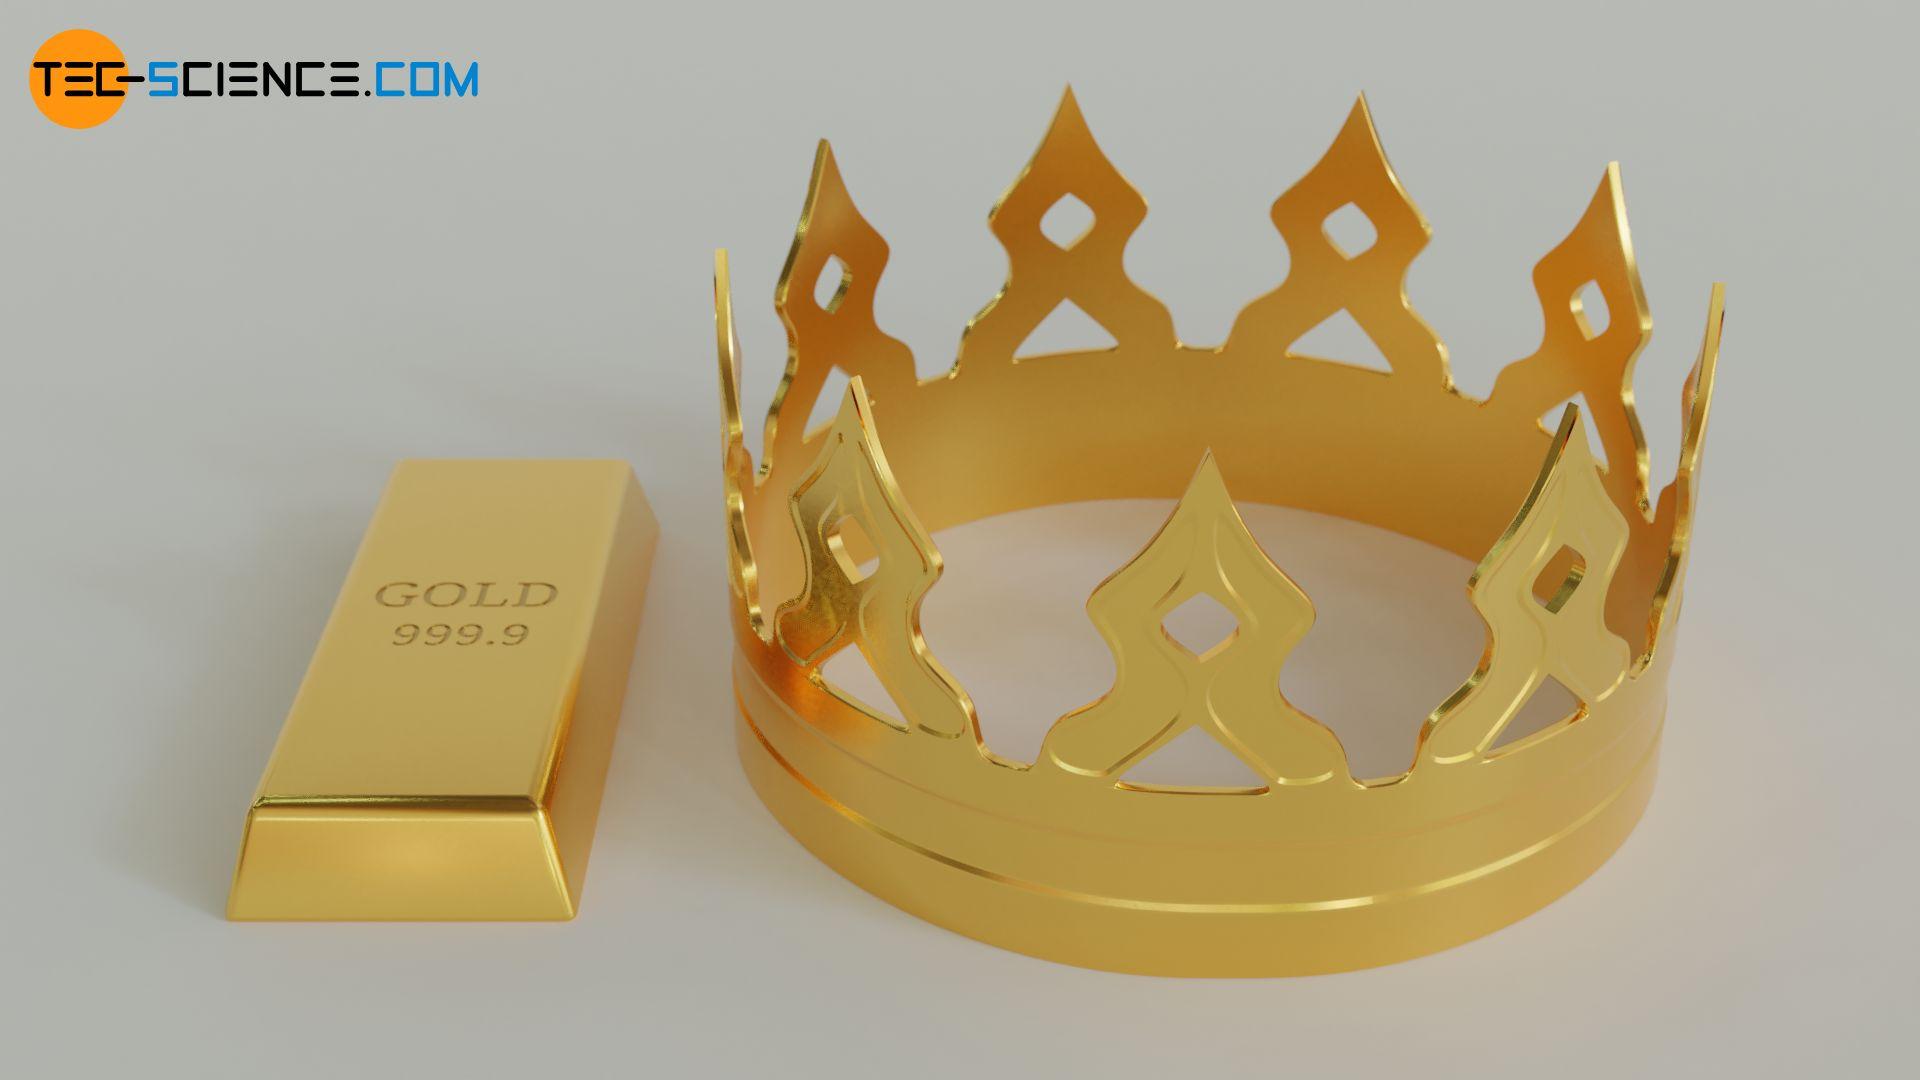 Gold ingot and crown